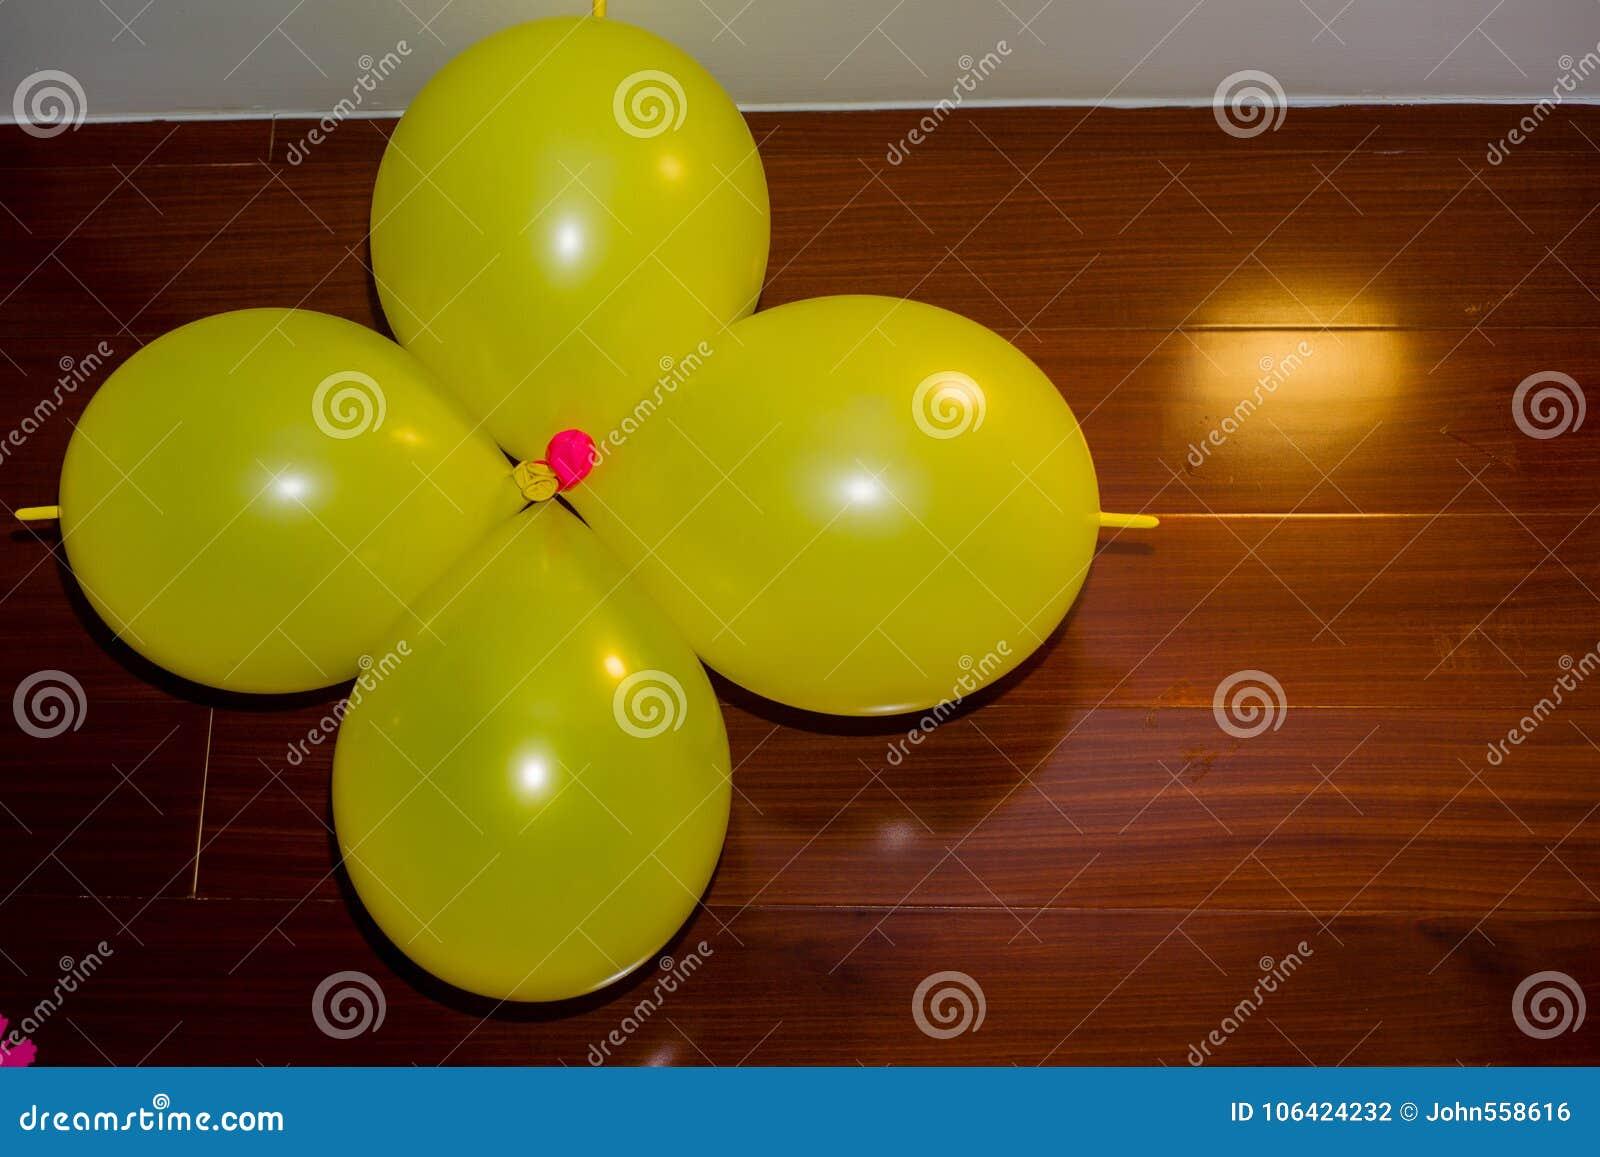 The yellow balloons